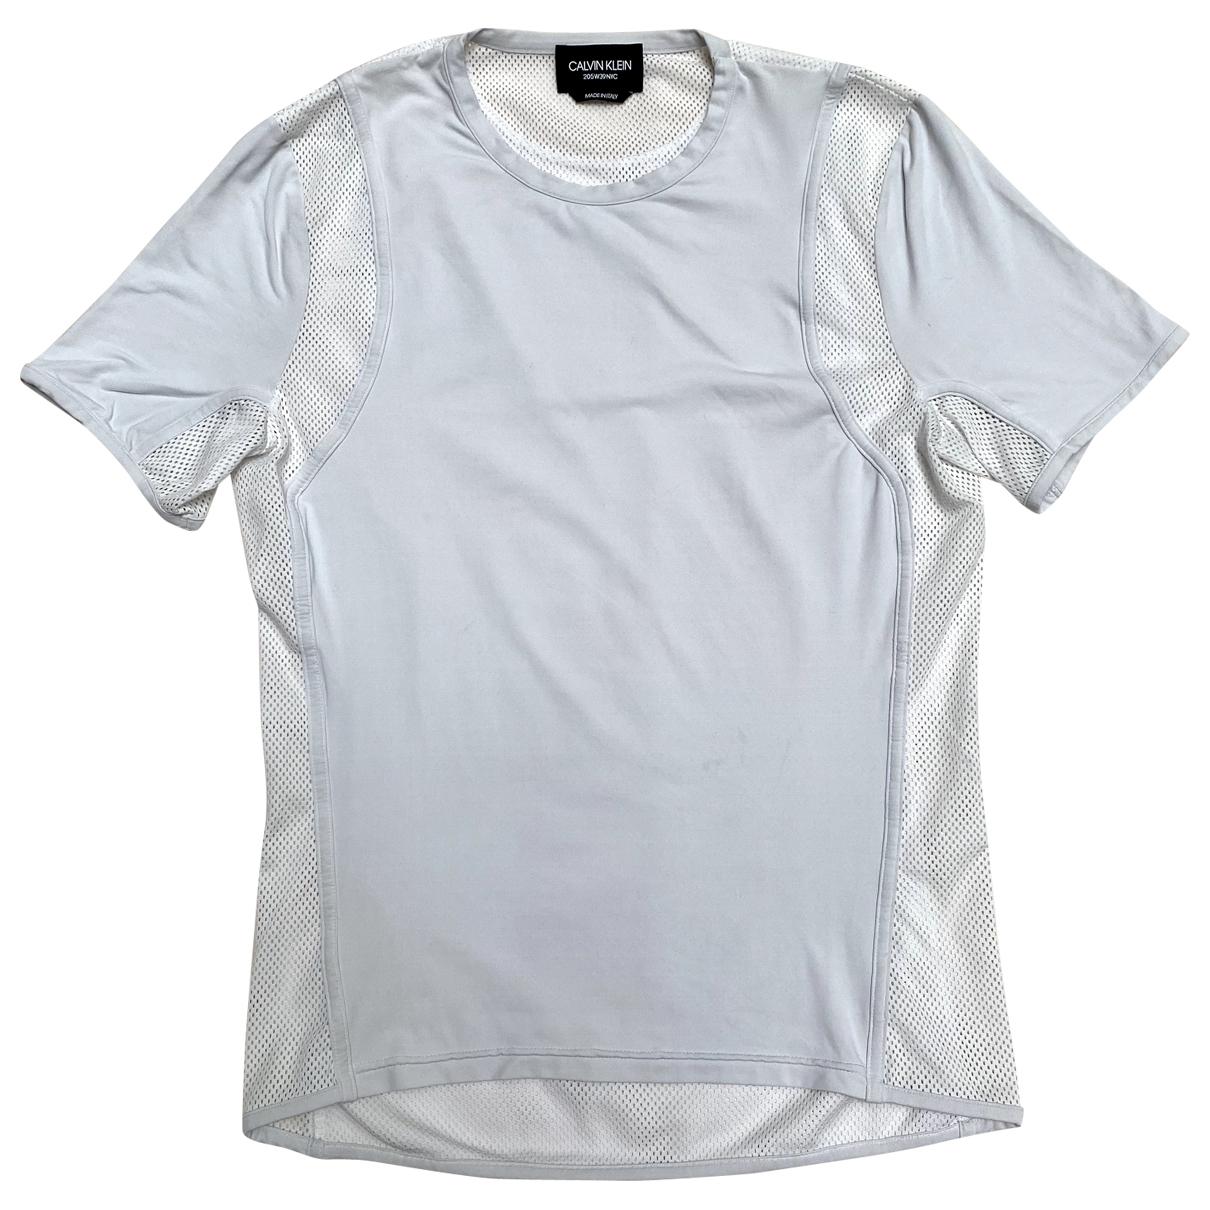 Calvin Klein 205w39nyc - Tee shirts   pour homme en lycra - blanc